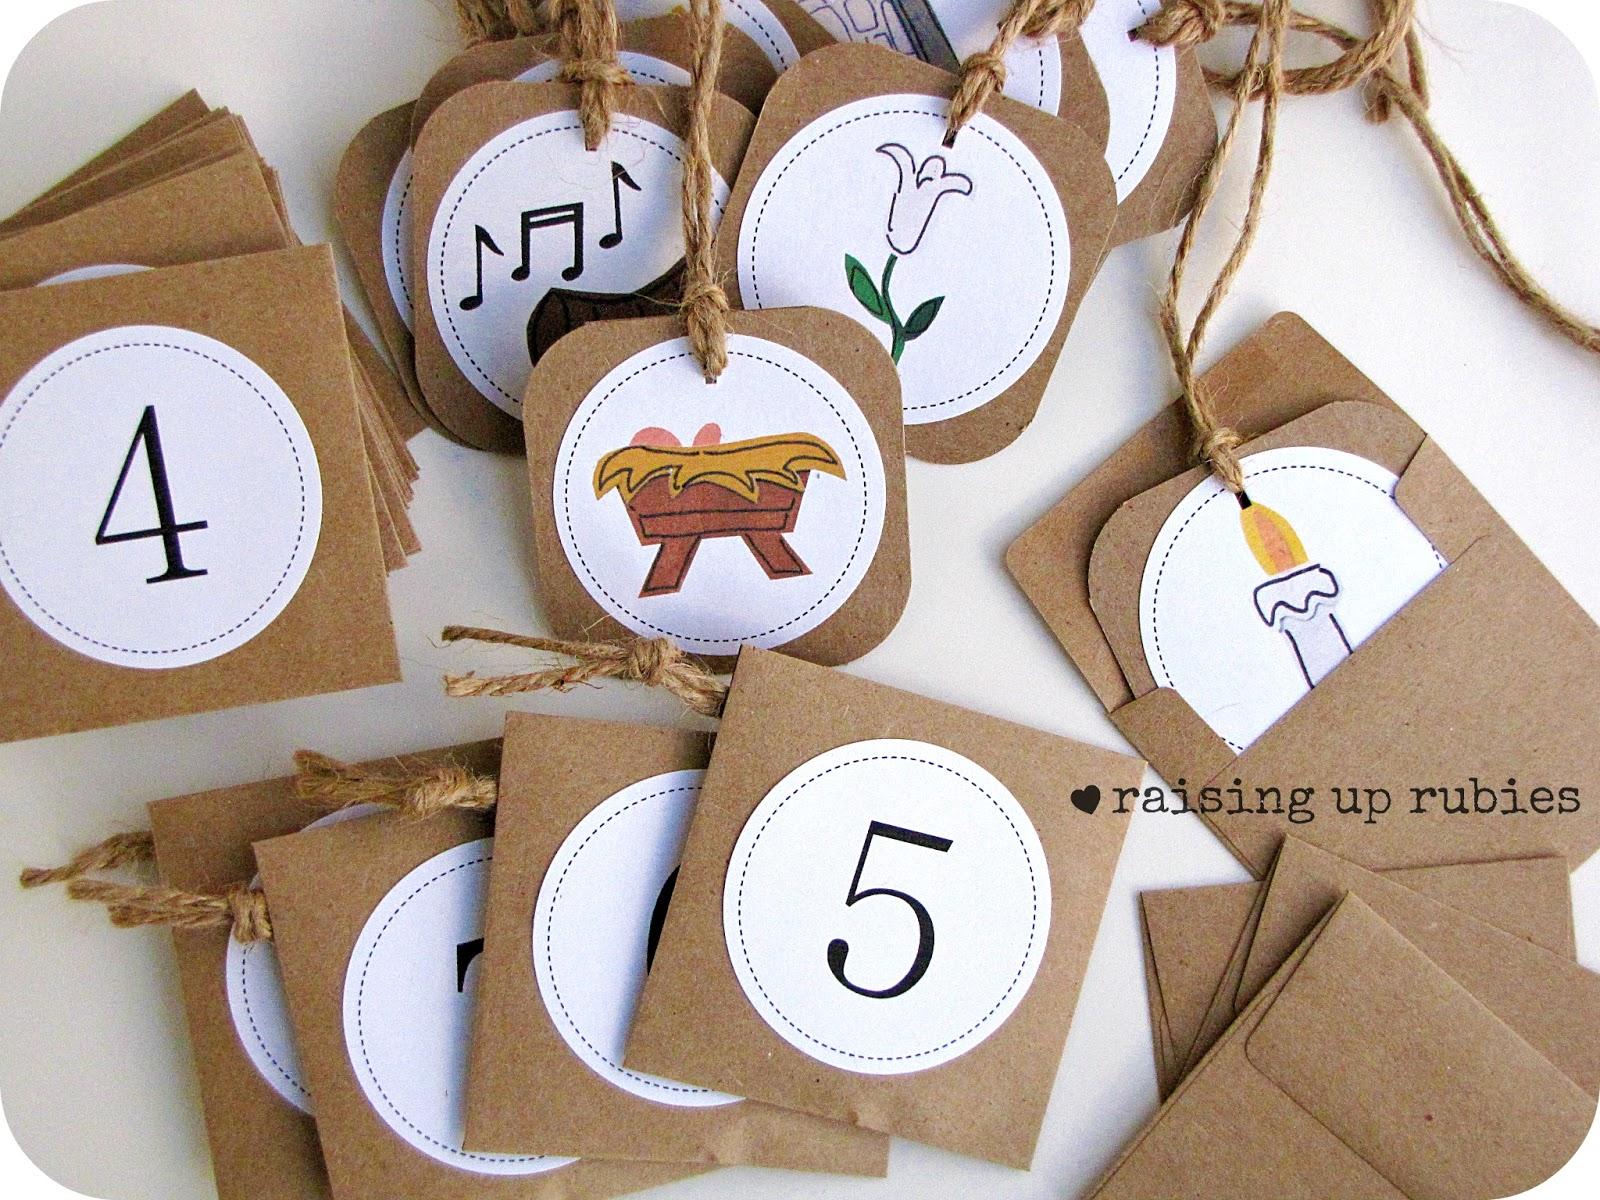 Raising Up Rubies Blog Celebrating Christmas With A Jesse Tree